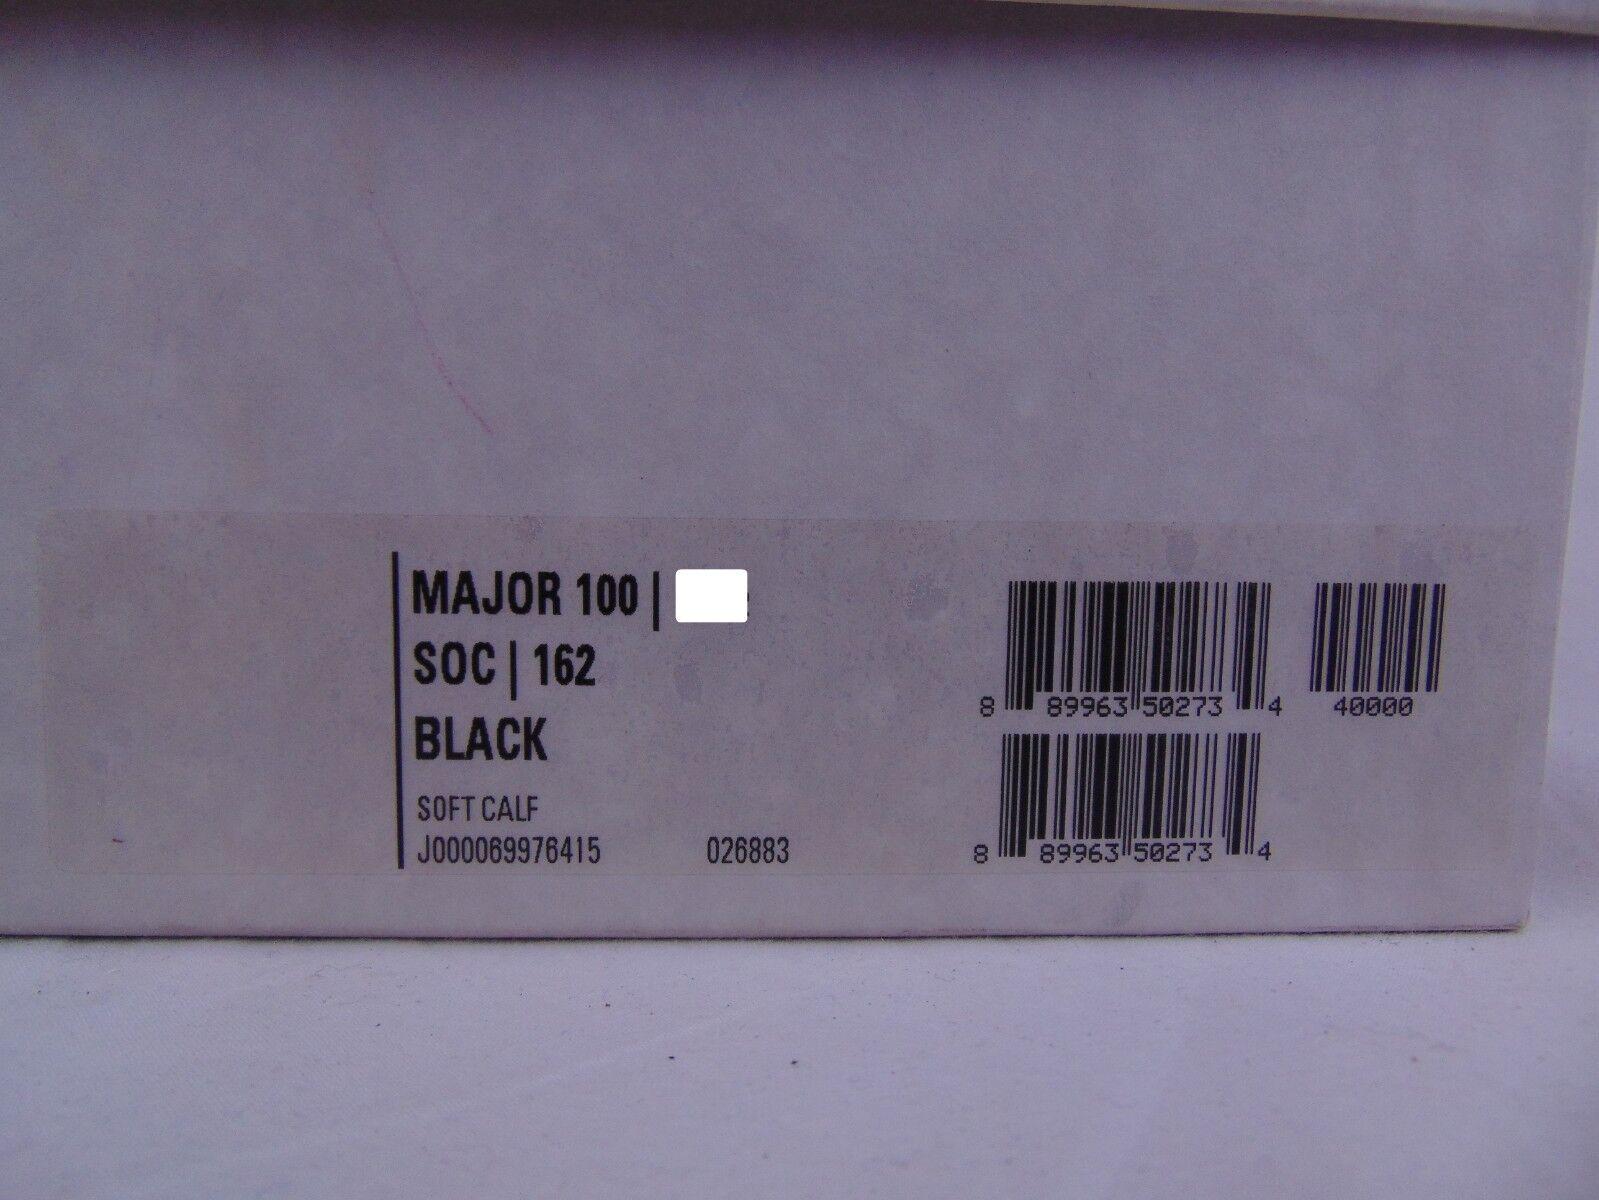 New in Box Jimmy Choo Major 100 Noir Cuir Cuir Cuir Boucle Cheville Bottes Escarpins 39 9 Italie 9a23f6